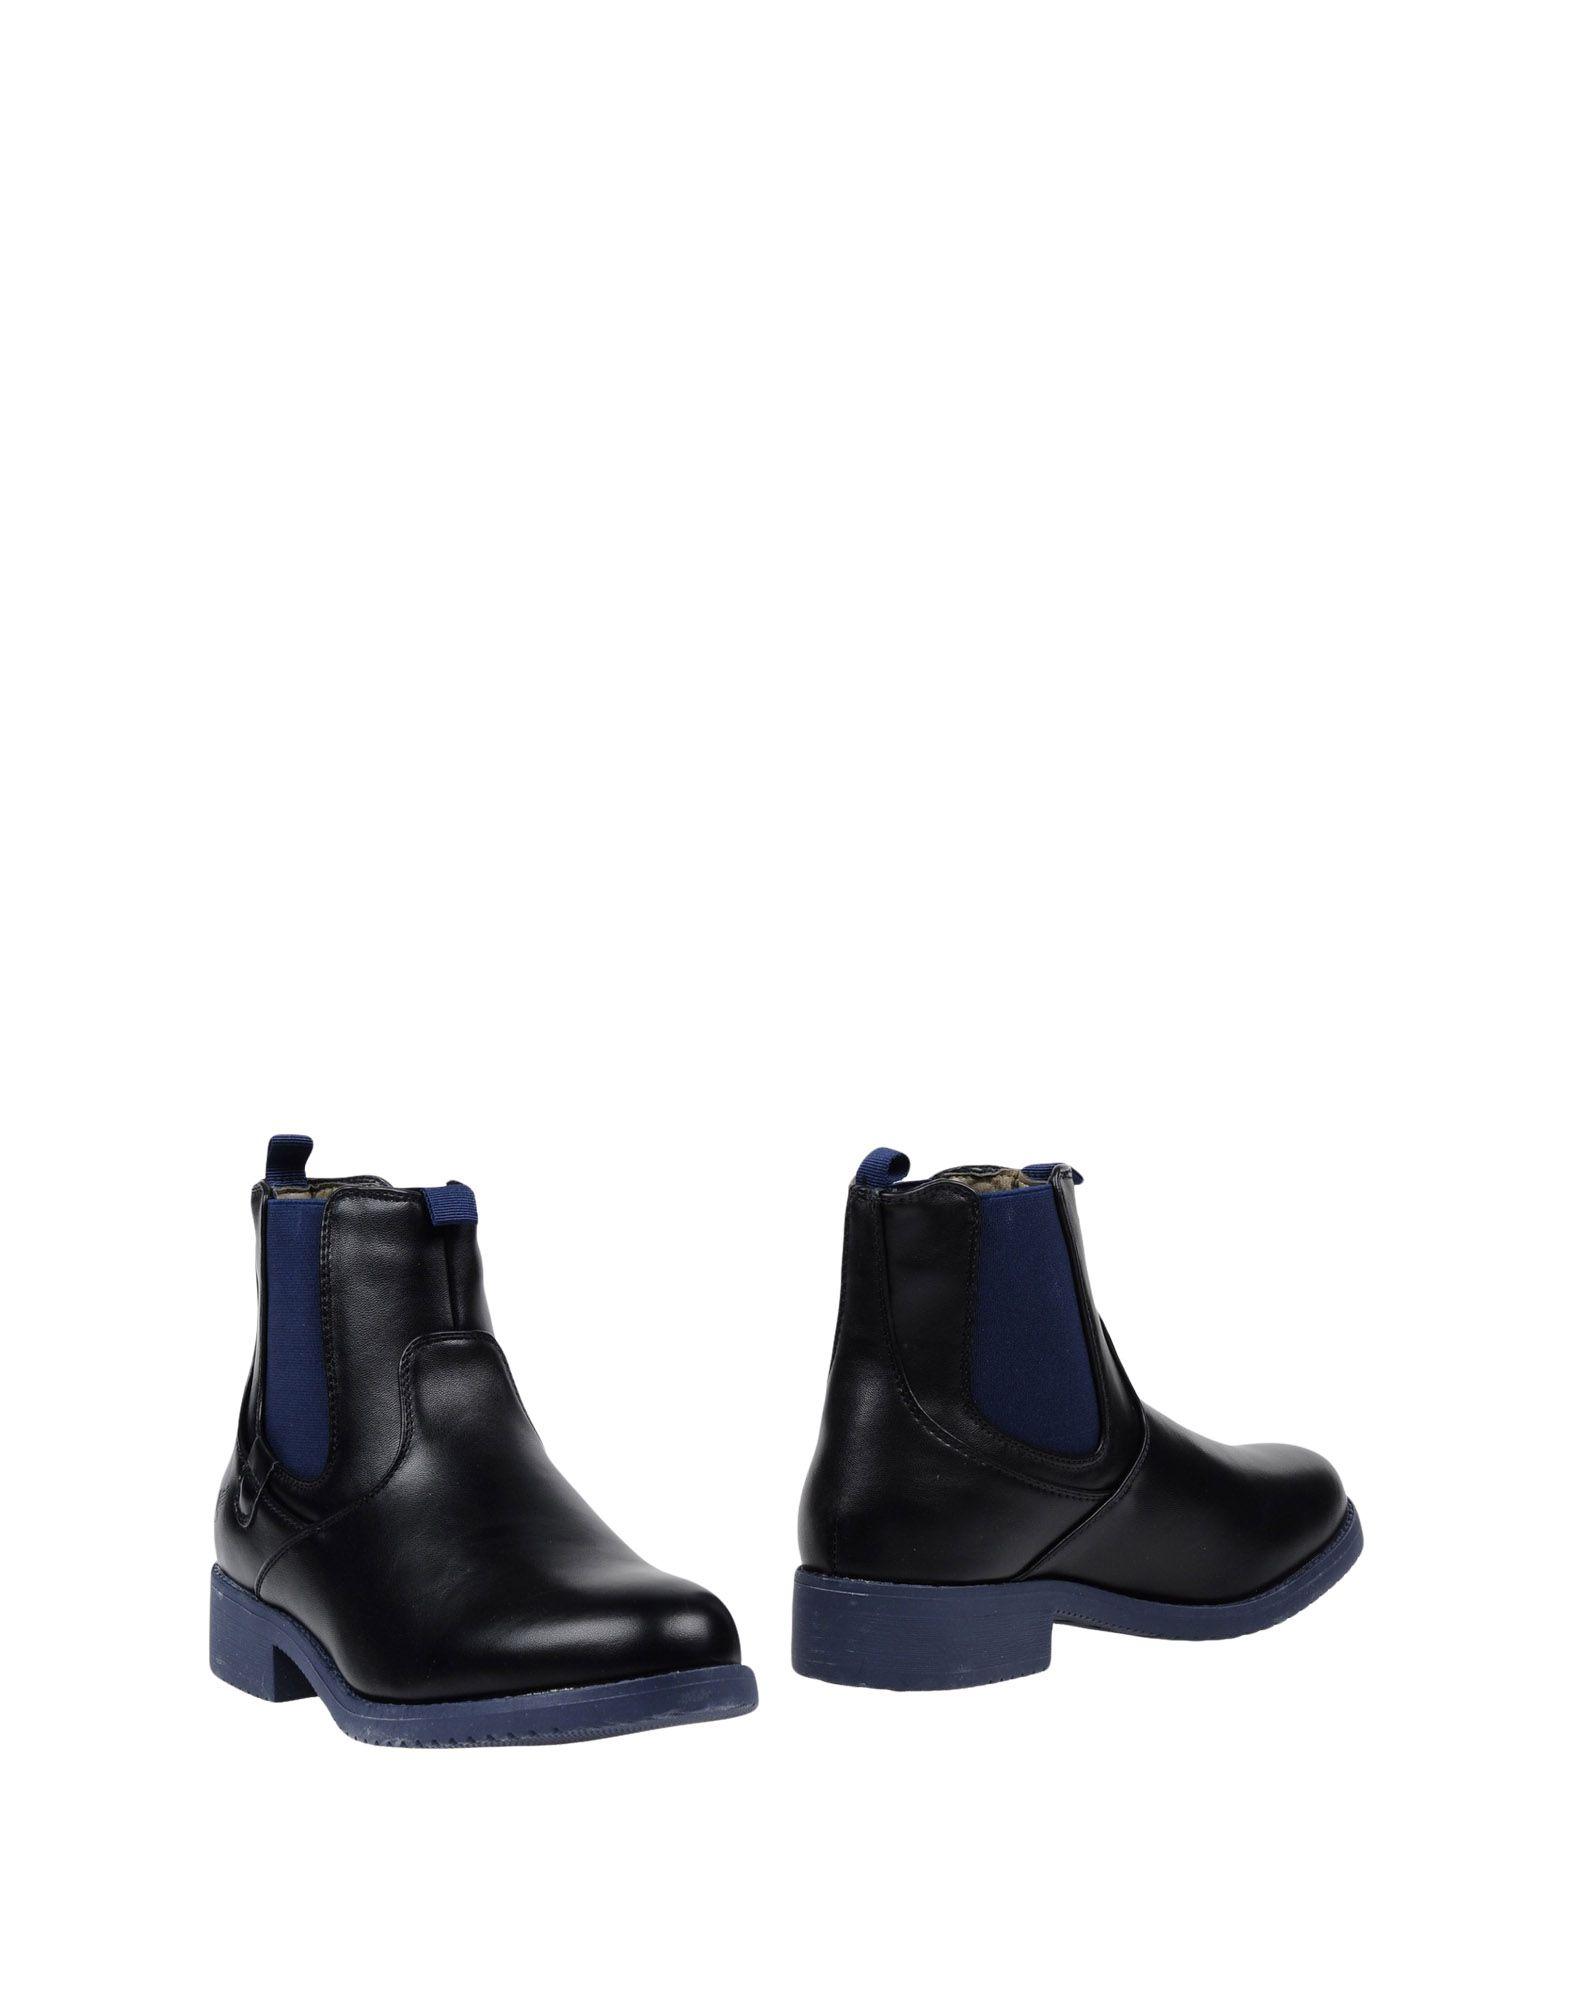 Avirex Ankle Boot - Women Avirex Avirex Women Ankle Boots online on  United Kingdom - 11454264DV 3a65a8